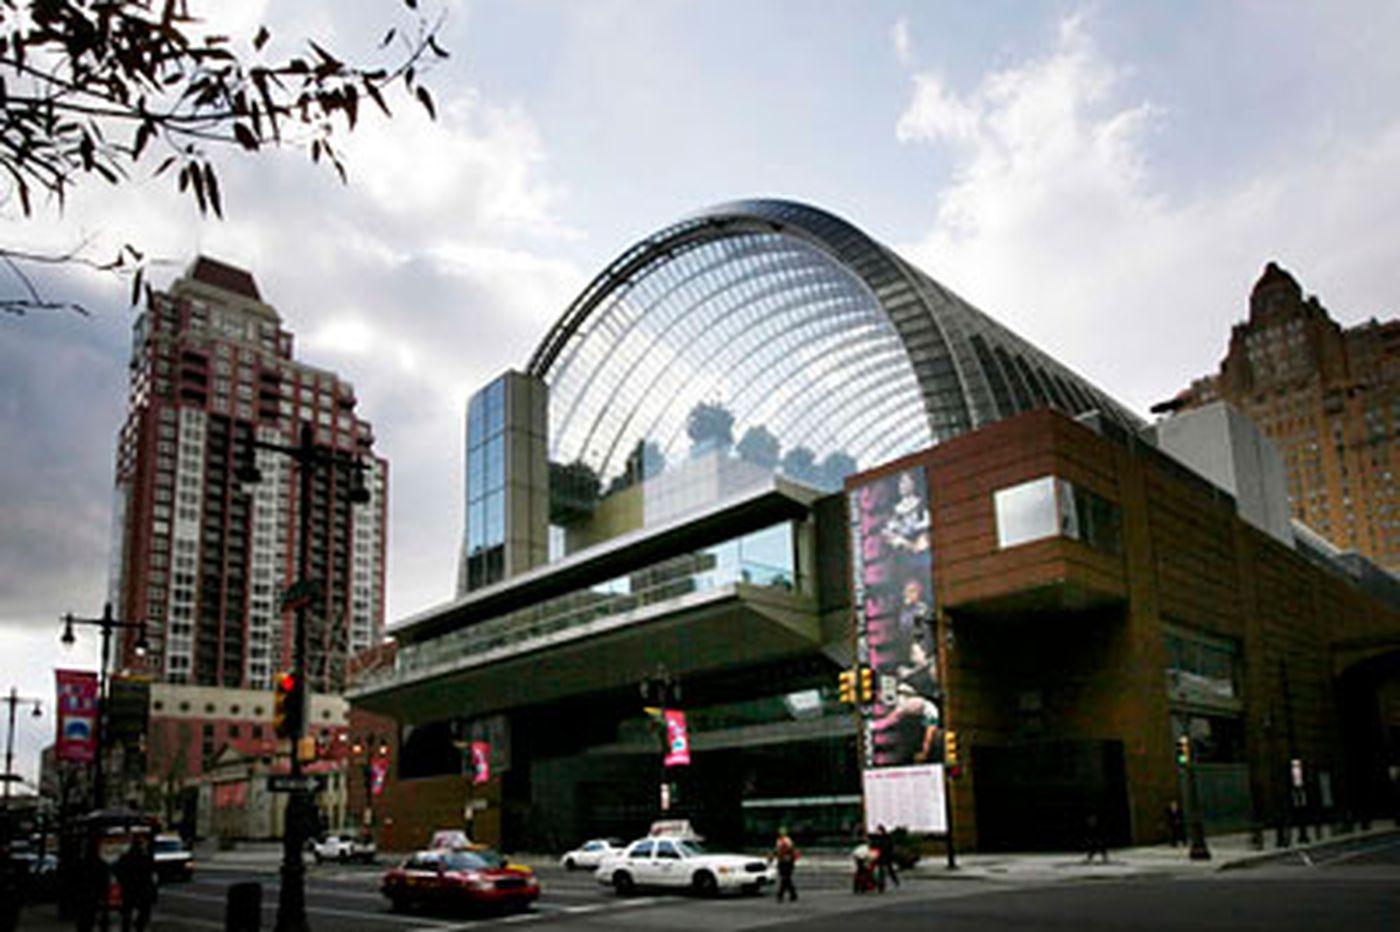 William Penn Foundation makes $10.9 million in arts grants